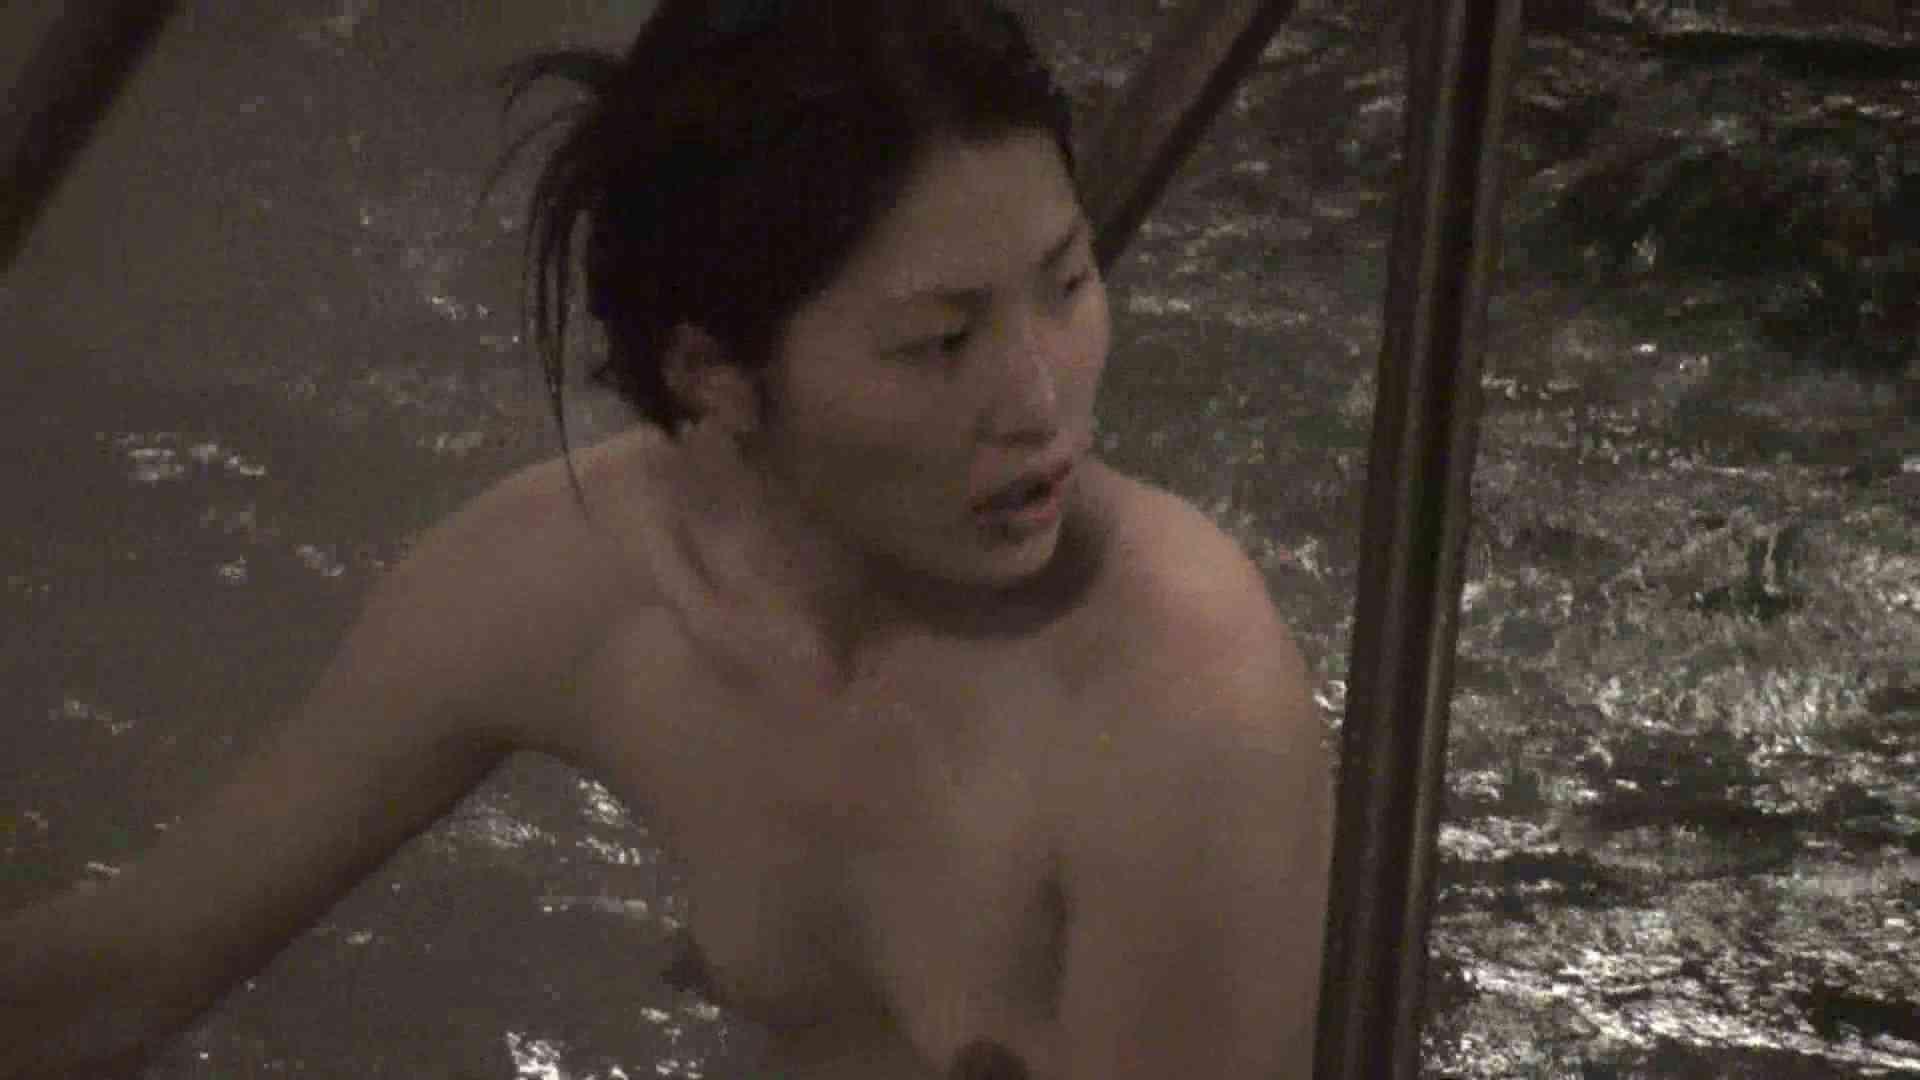 Aquaな露天風呂Vol.406 露天風呂 | OLのエロ生活  66連発 28